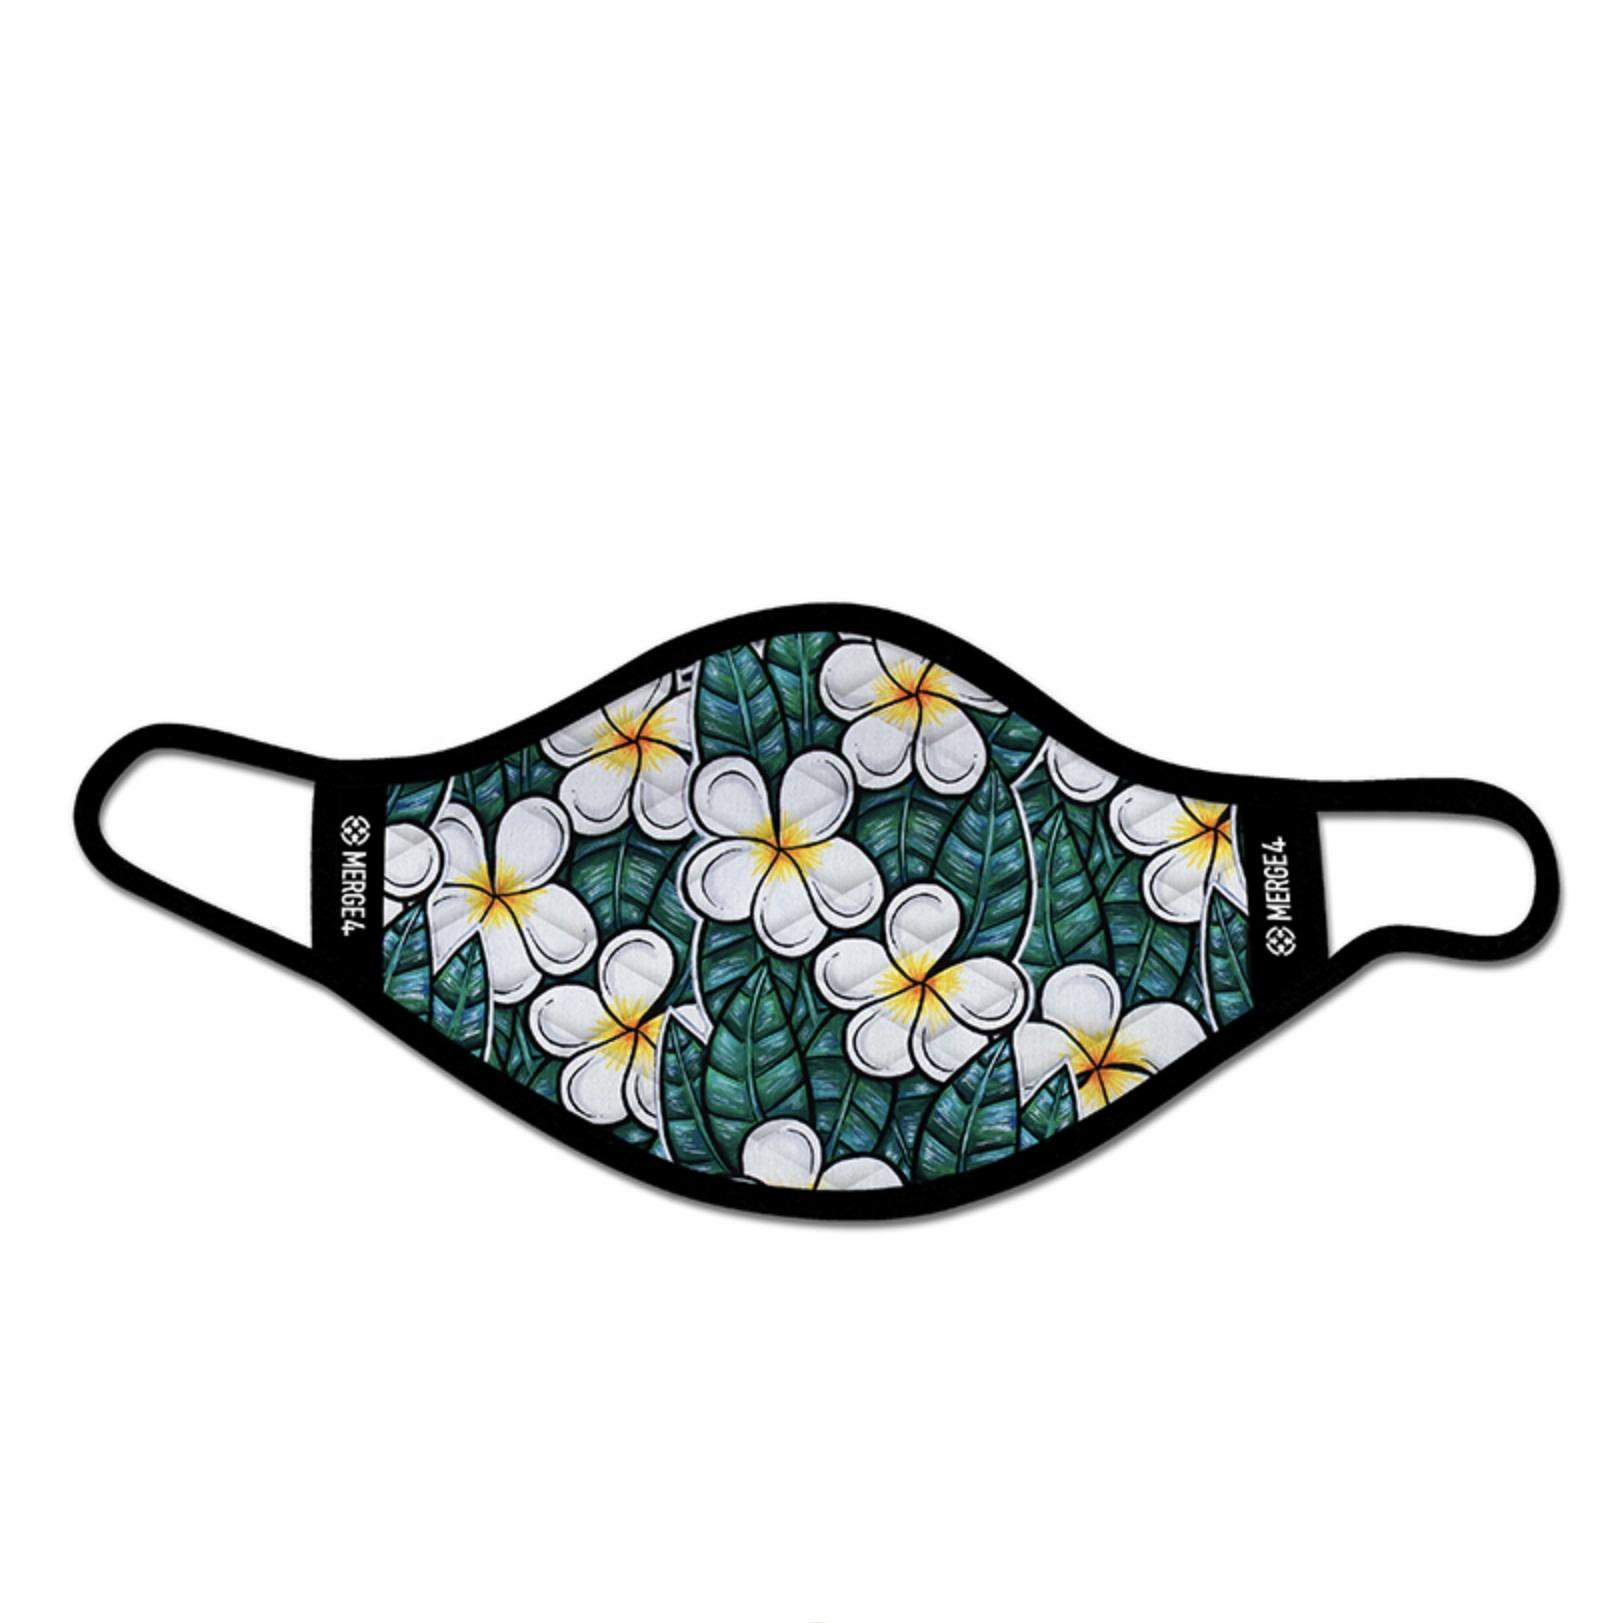 Merge 4 Merge 4 - Kaia Myall Flowers Mask